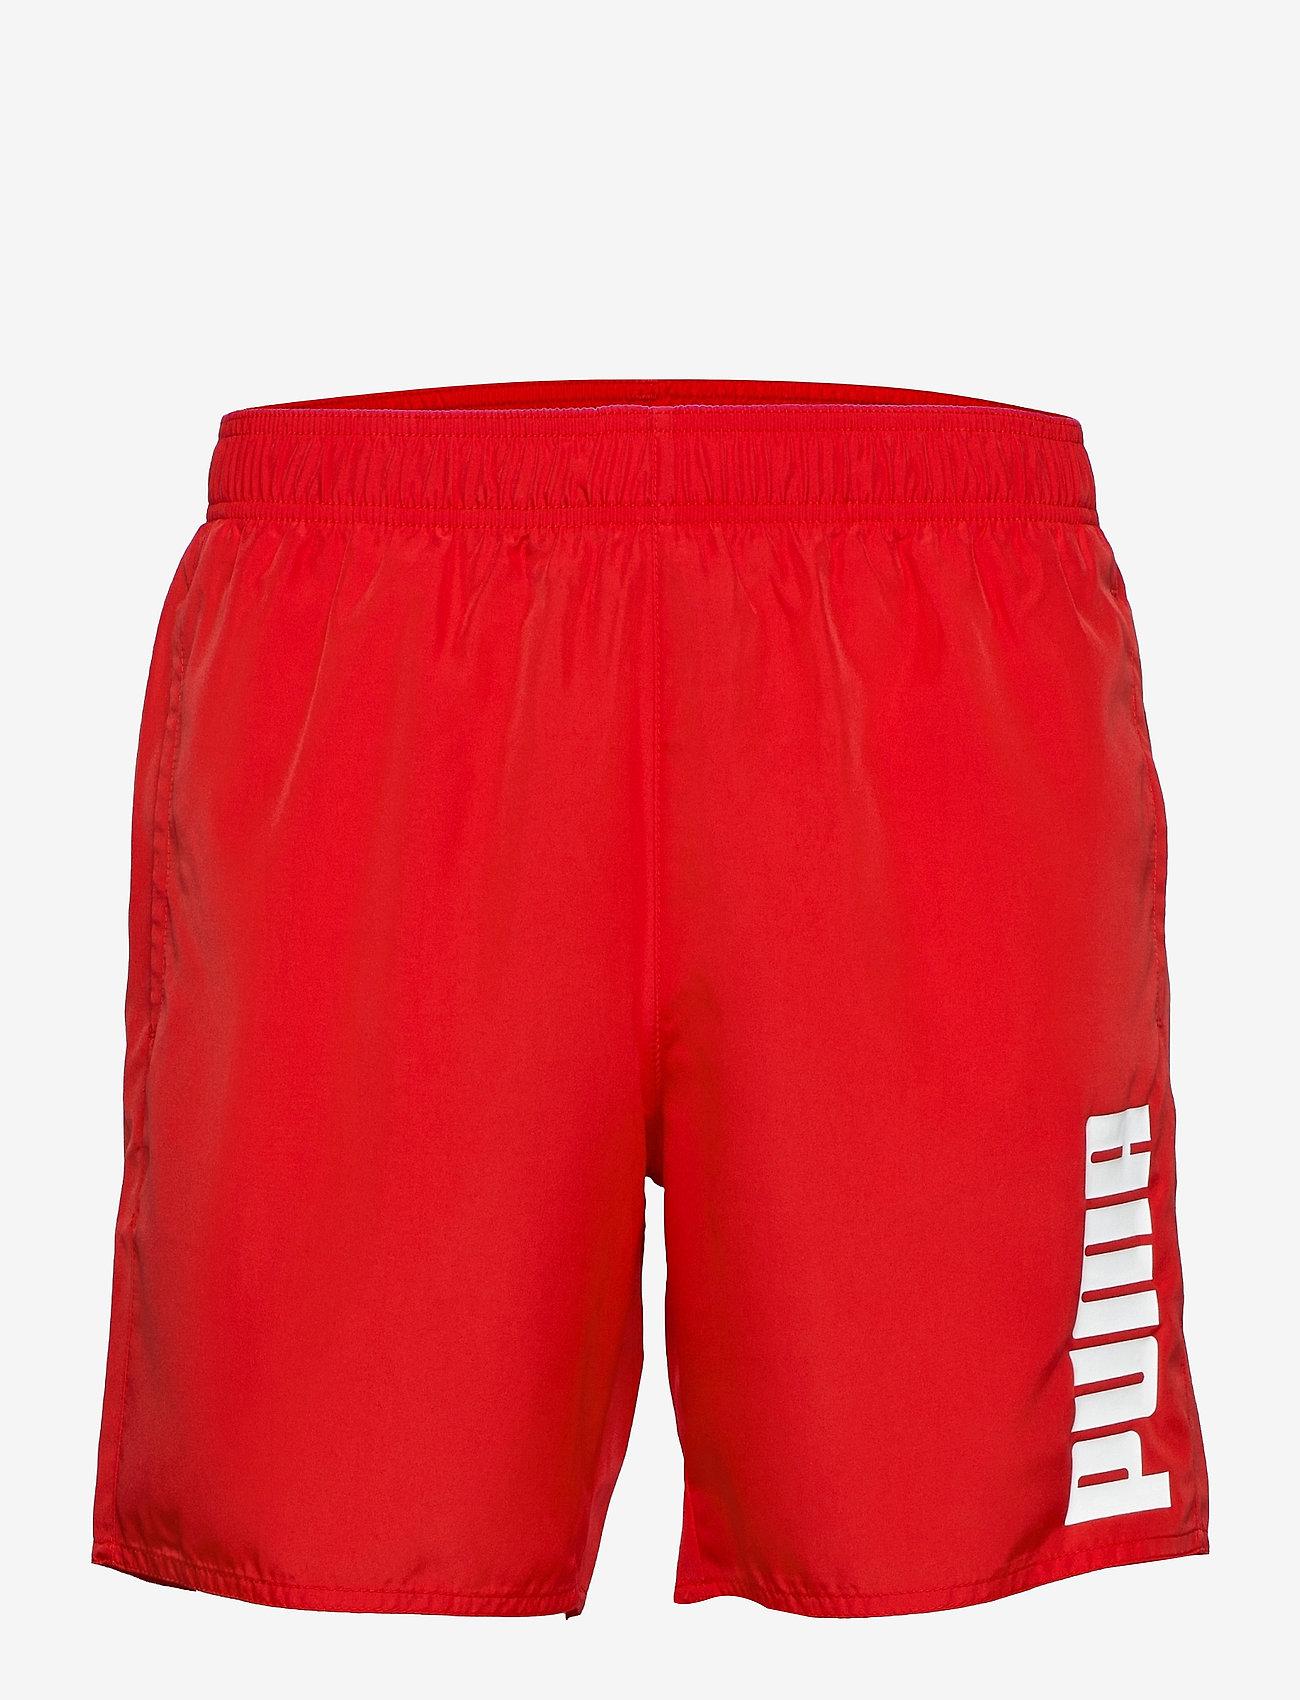 Puma Swim - PUMA SWIM MEN MID SHORTS 1P - badbyxor - red - 0